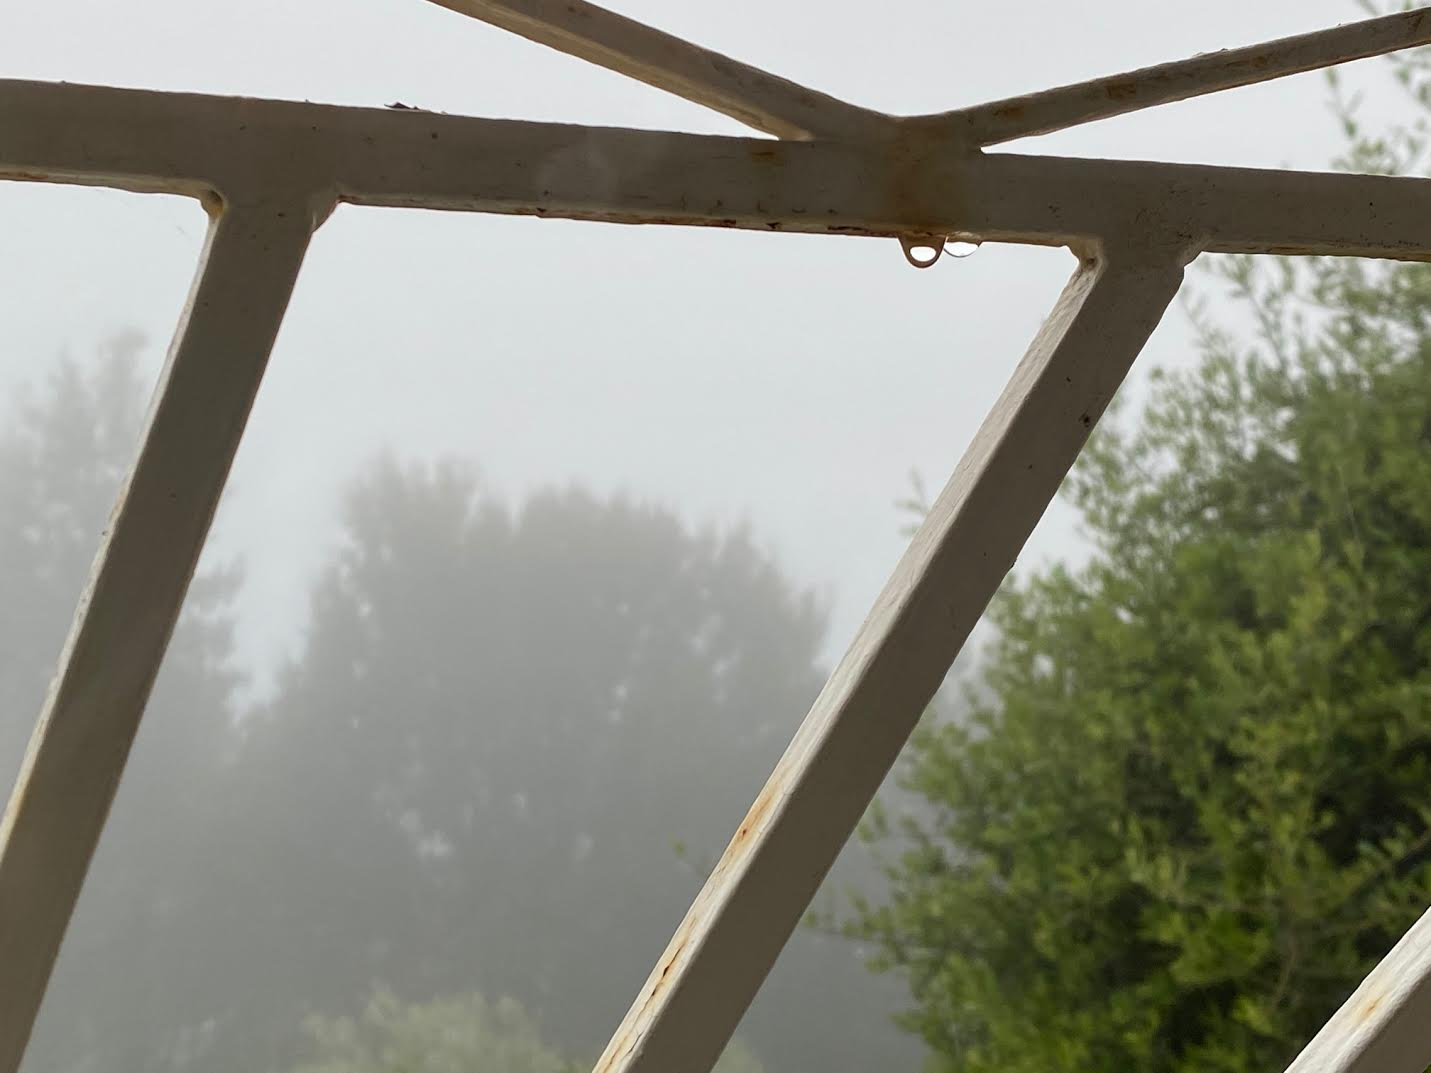 La campagne corse dans le brouillard